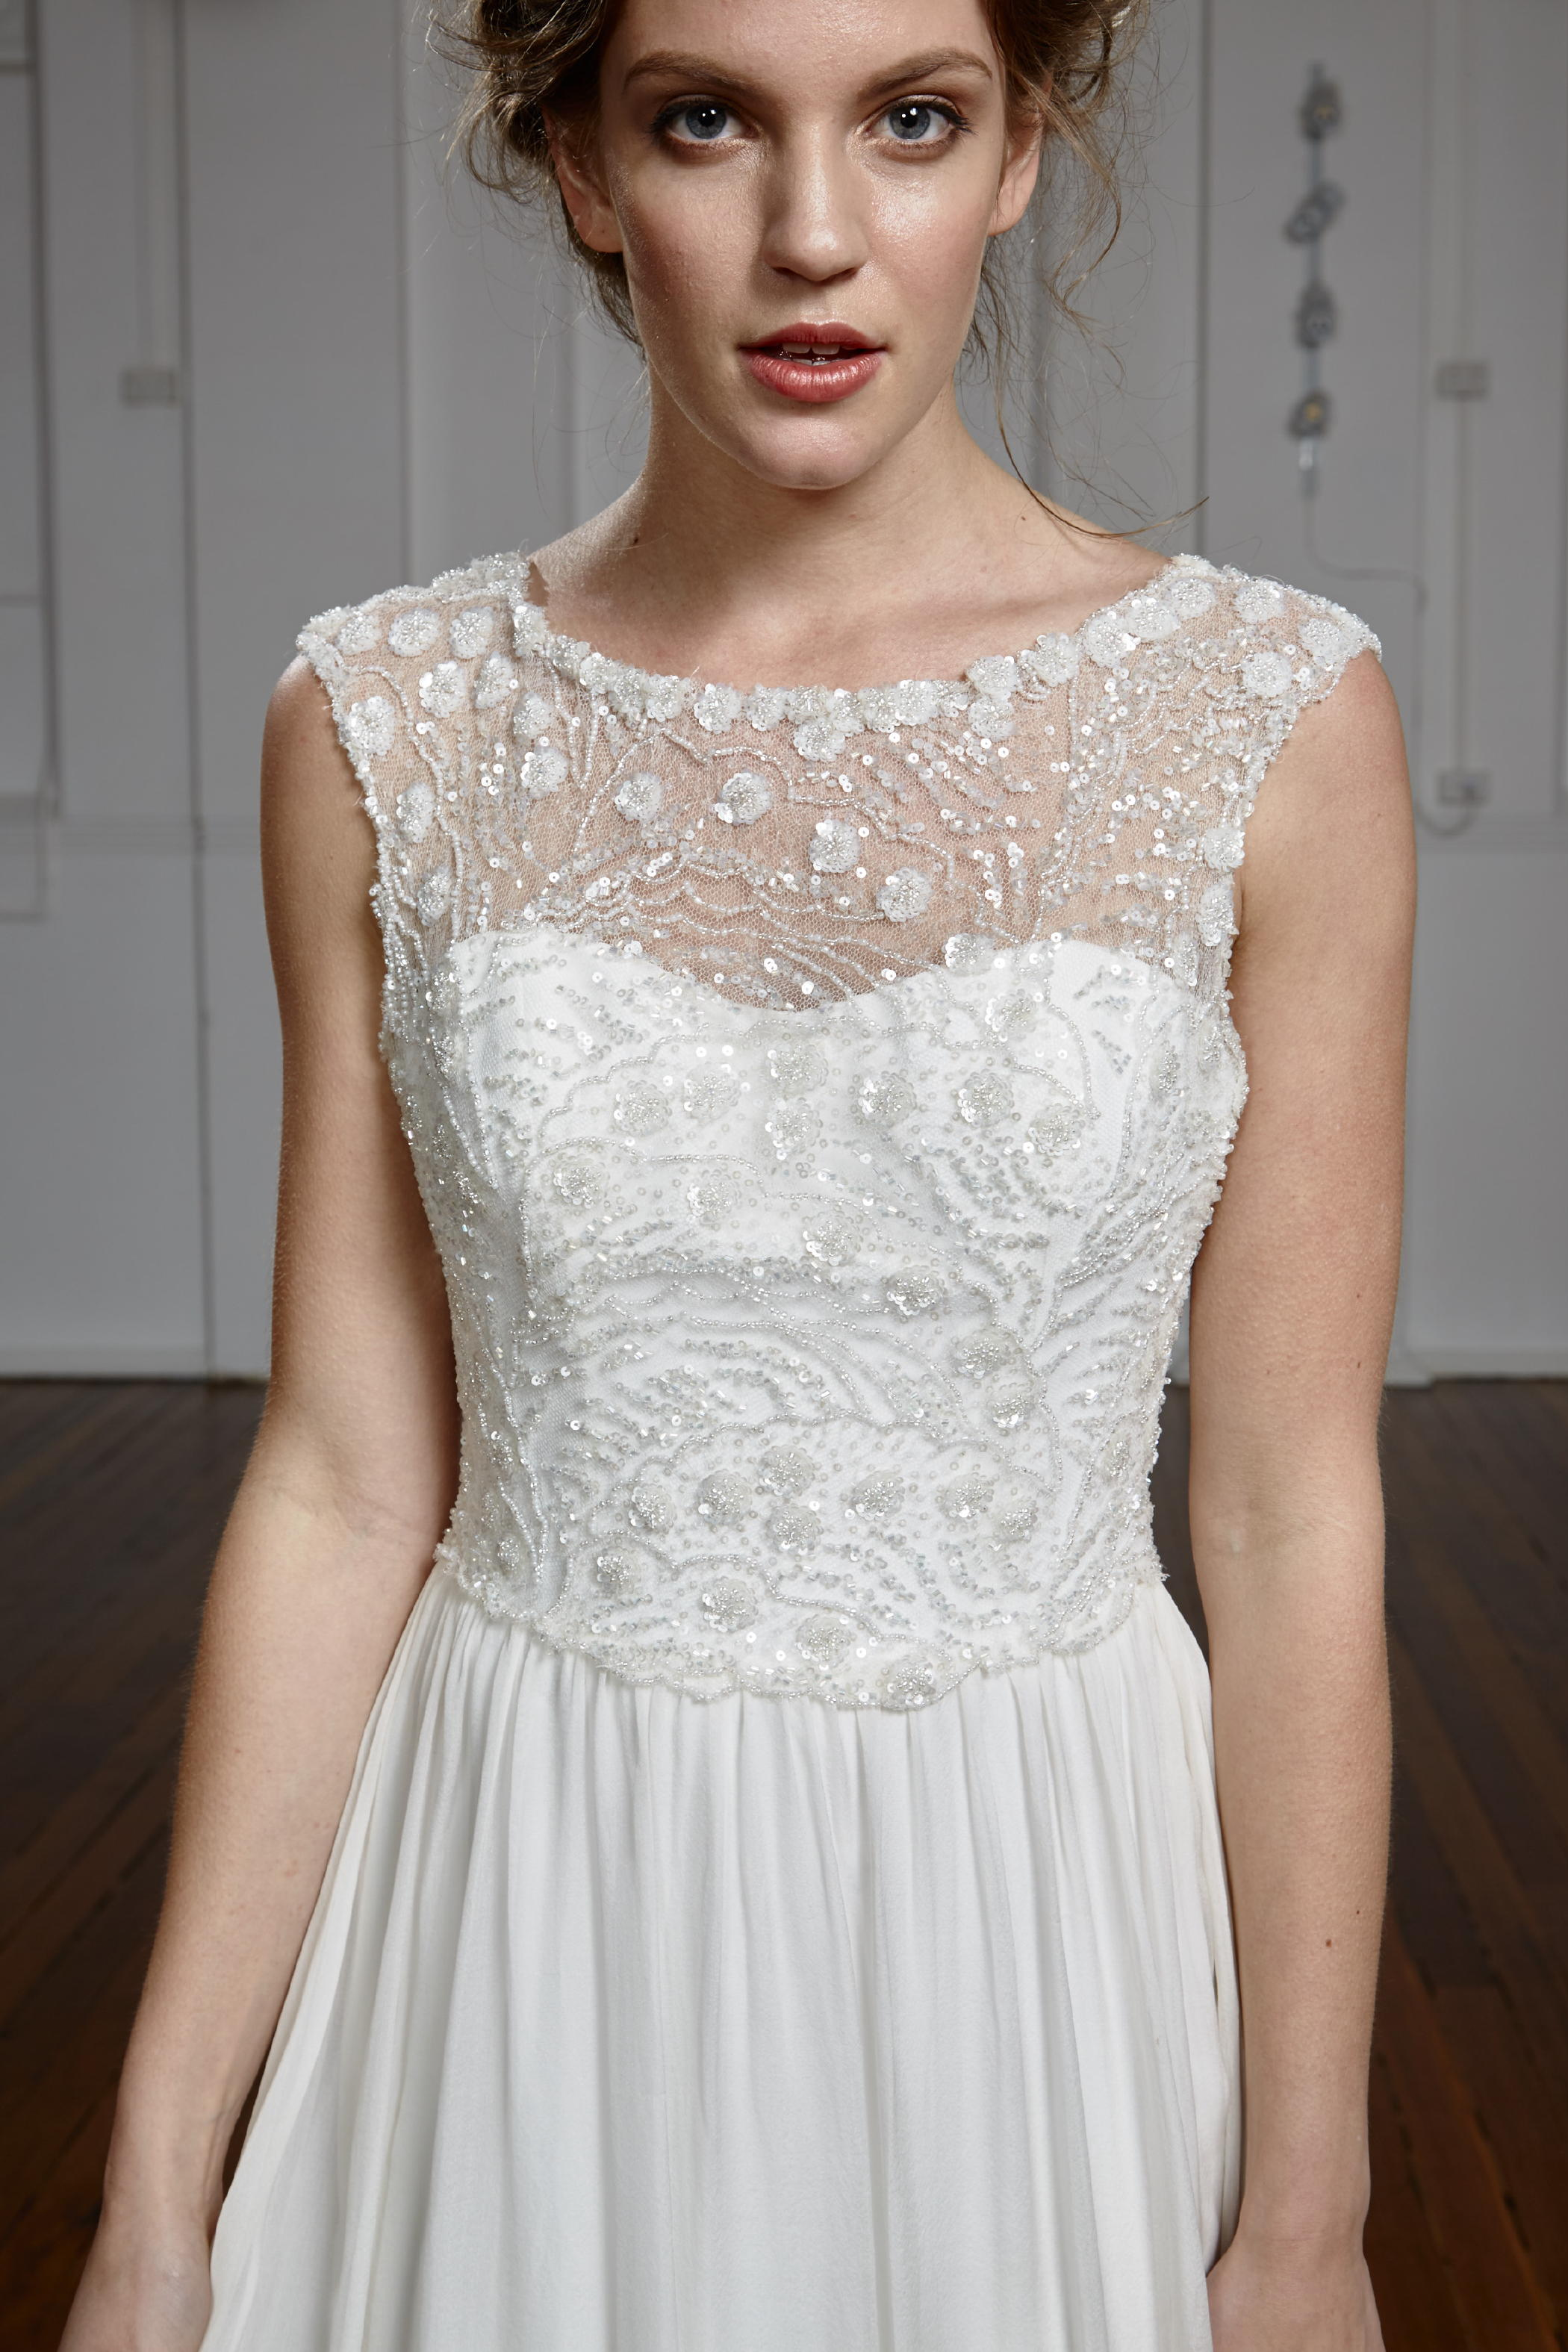 Dove Valentina summer bridal gown Tanya Anic Bridal photographyGrant Sparkes Carroll double bay sydney bridal_204.jpg